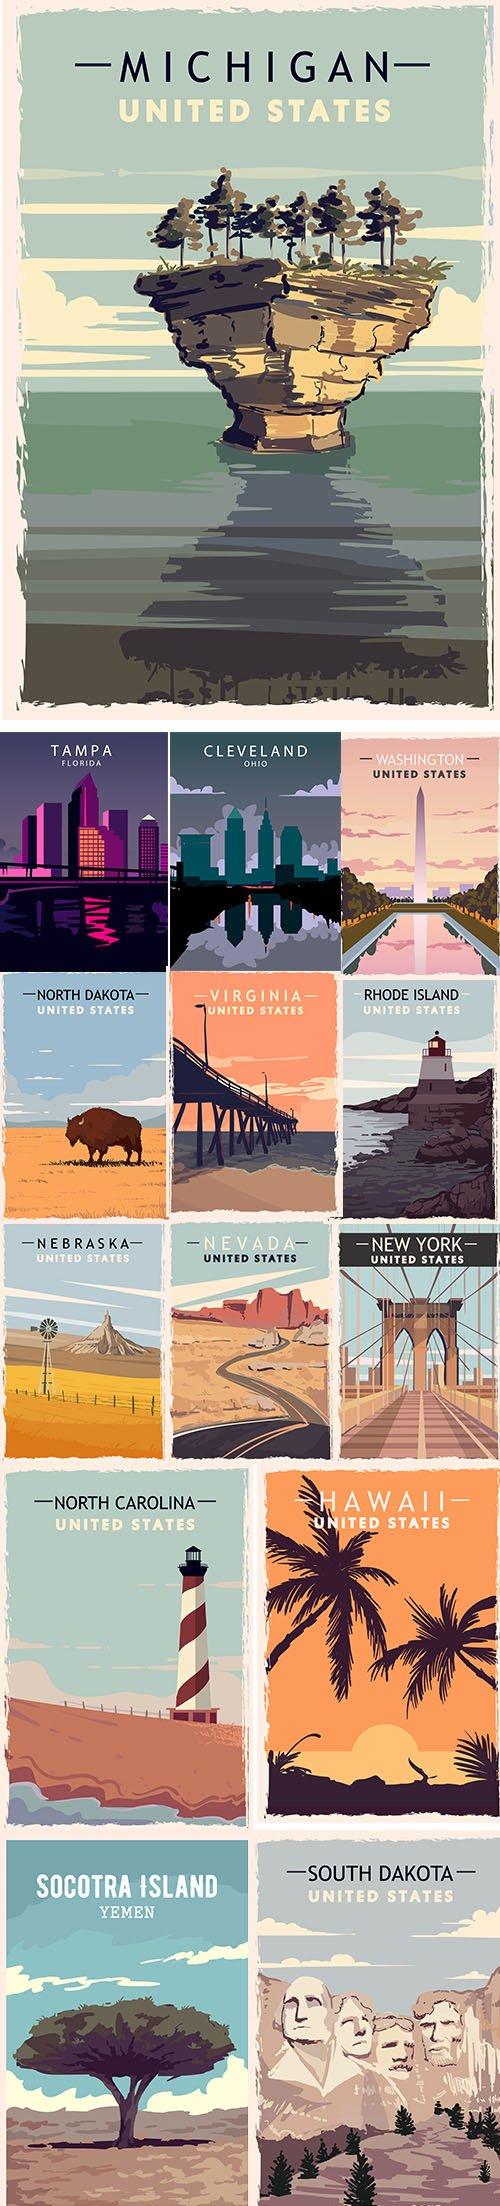 Retro Travel Illustration with Landscape on United States America Set